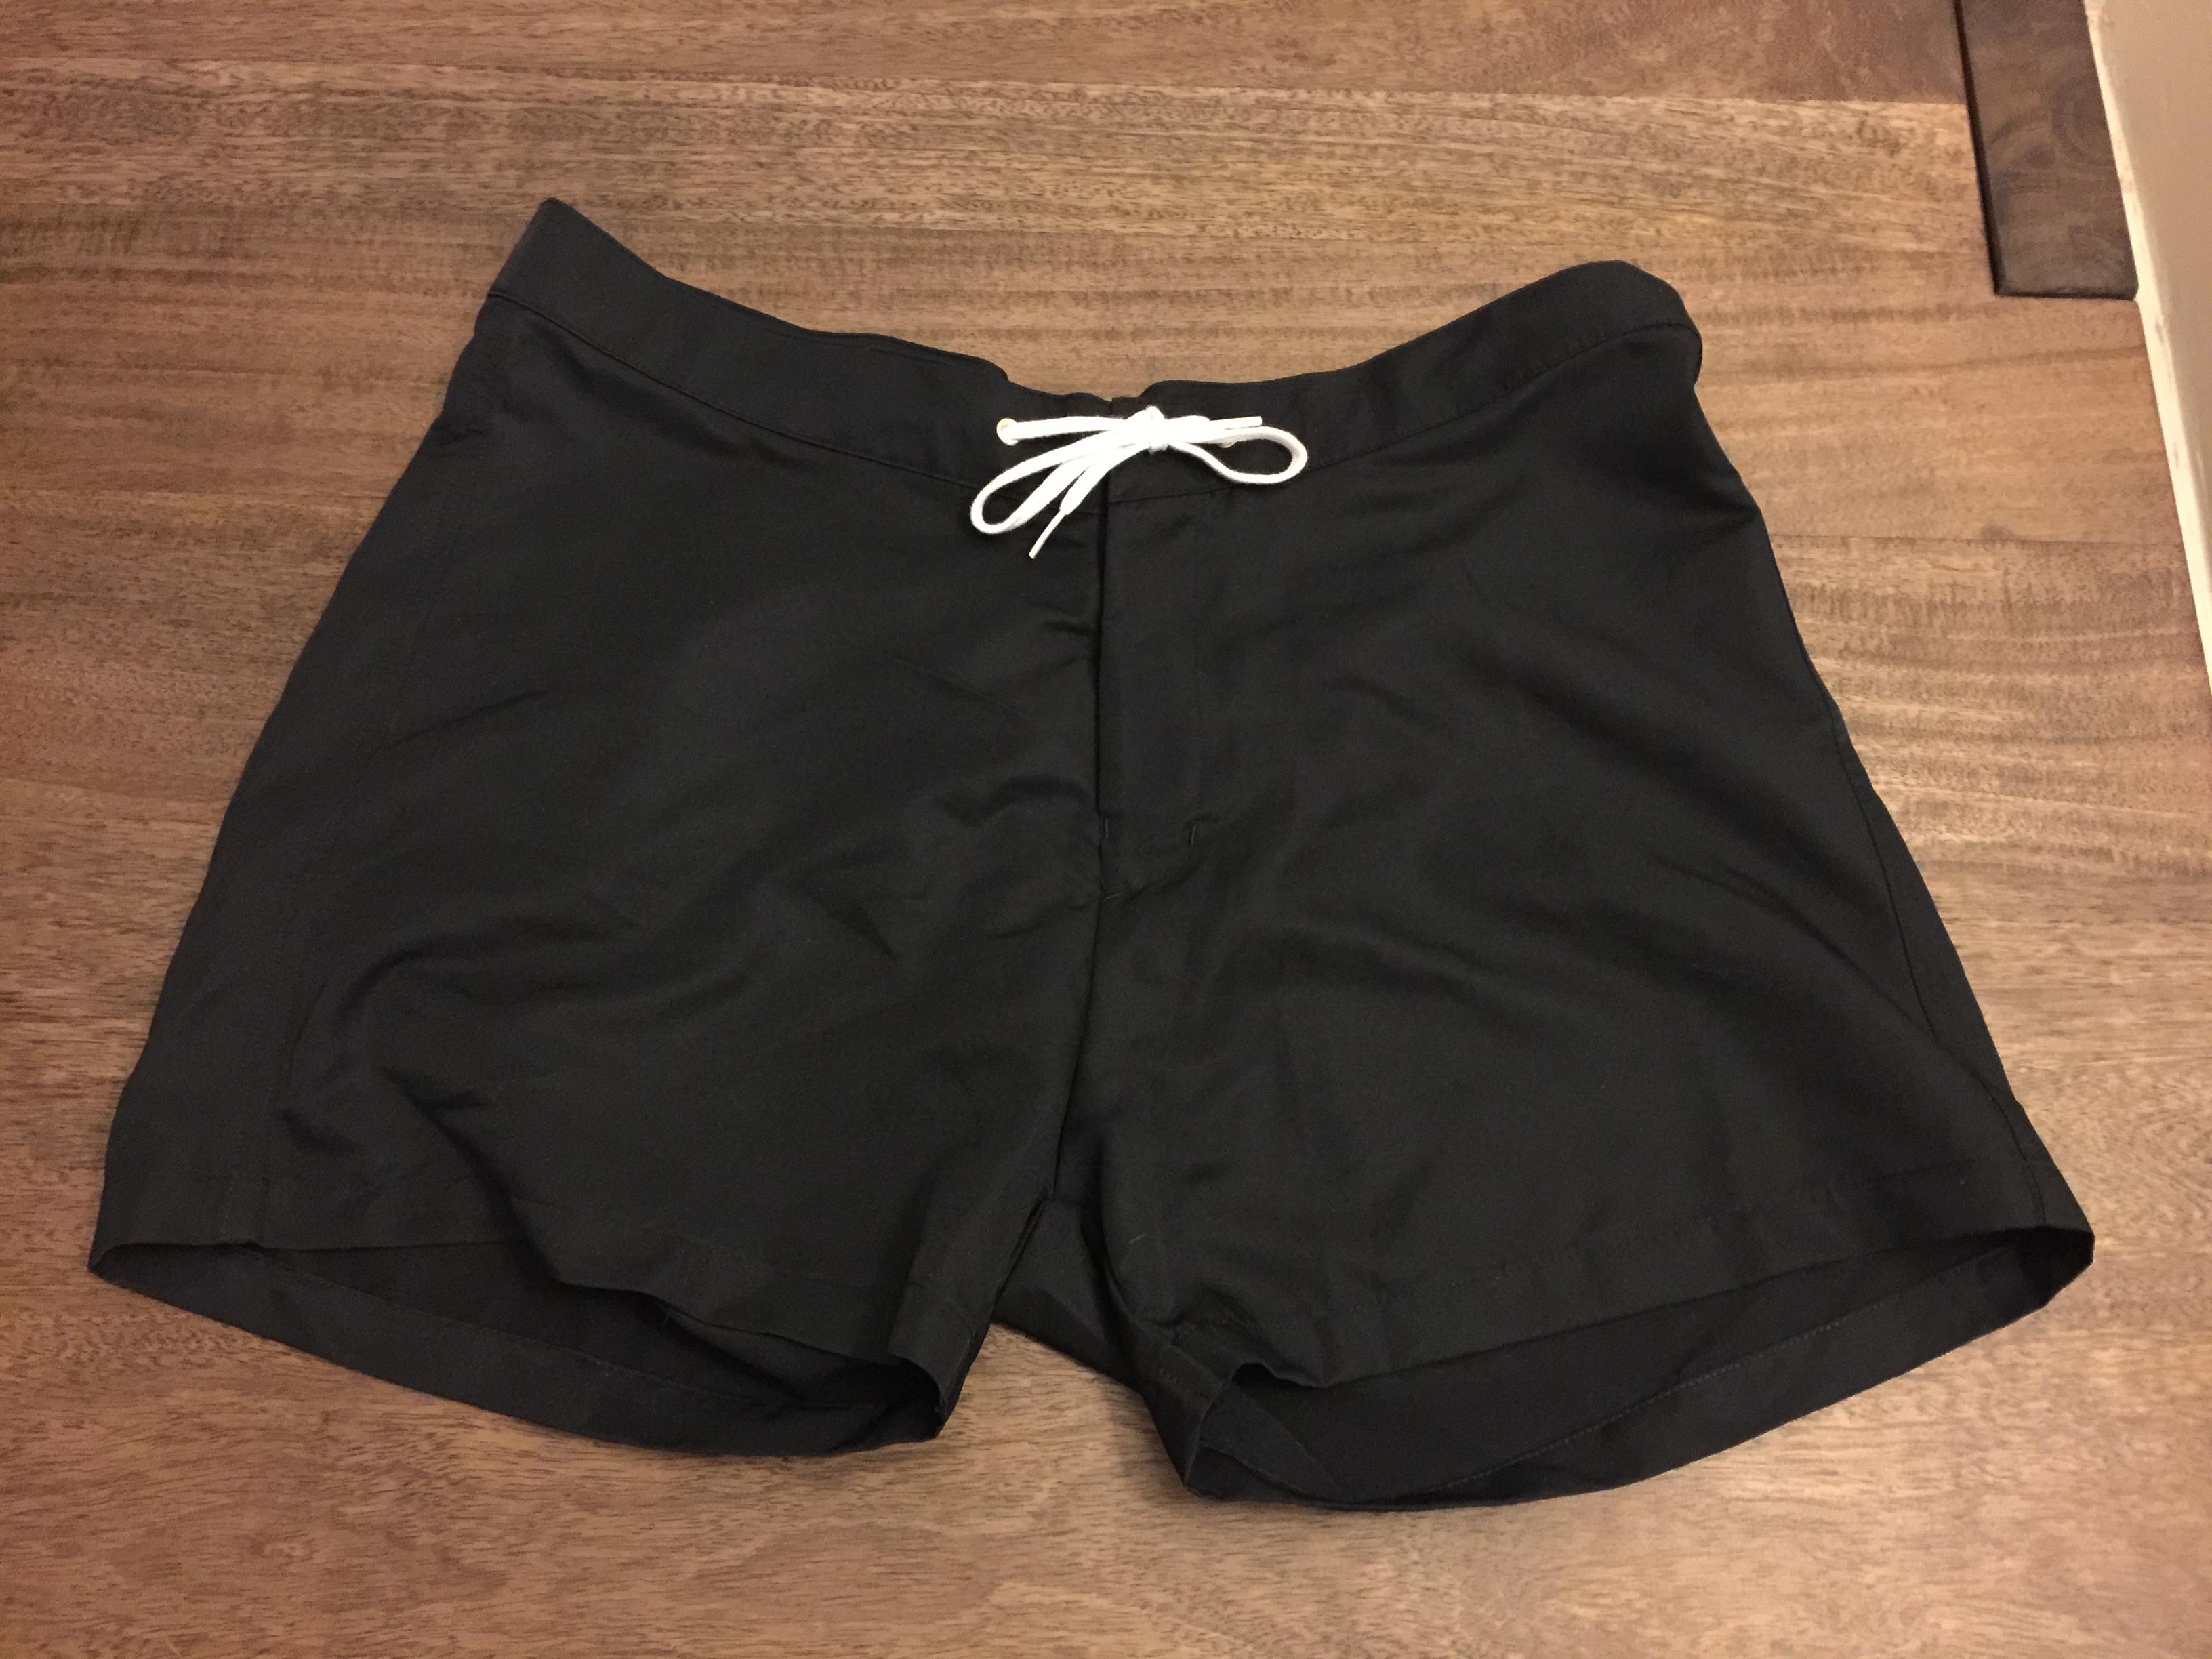 4f986b427d American Apparel Swim Shorts | Grailed